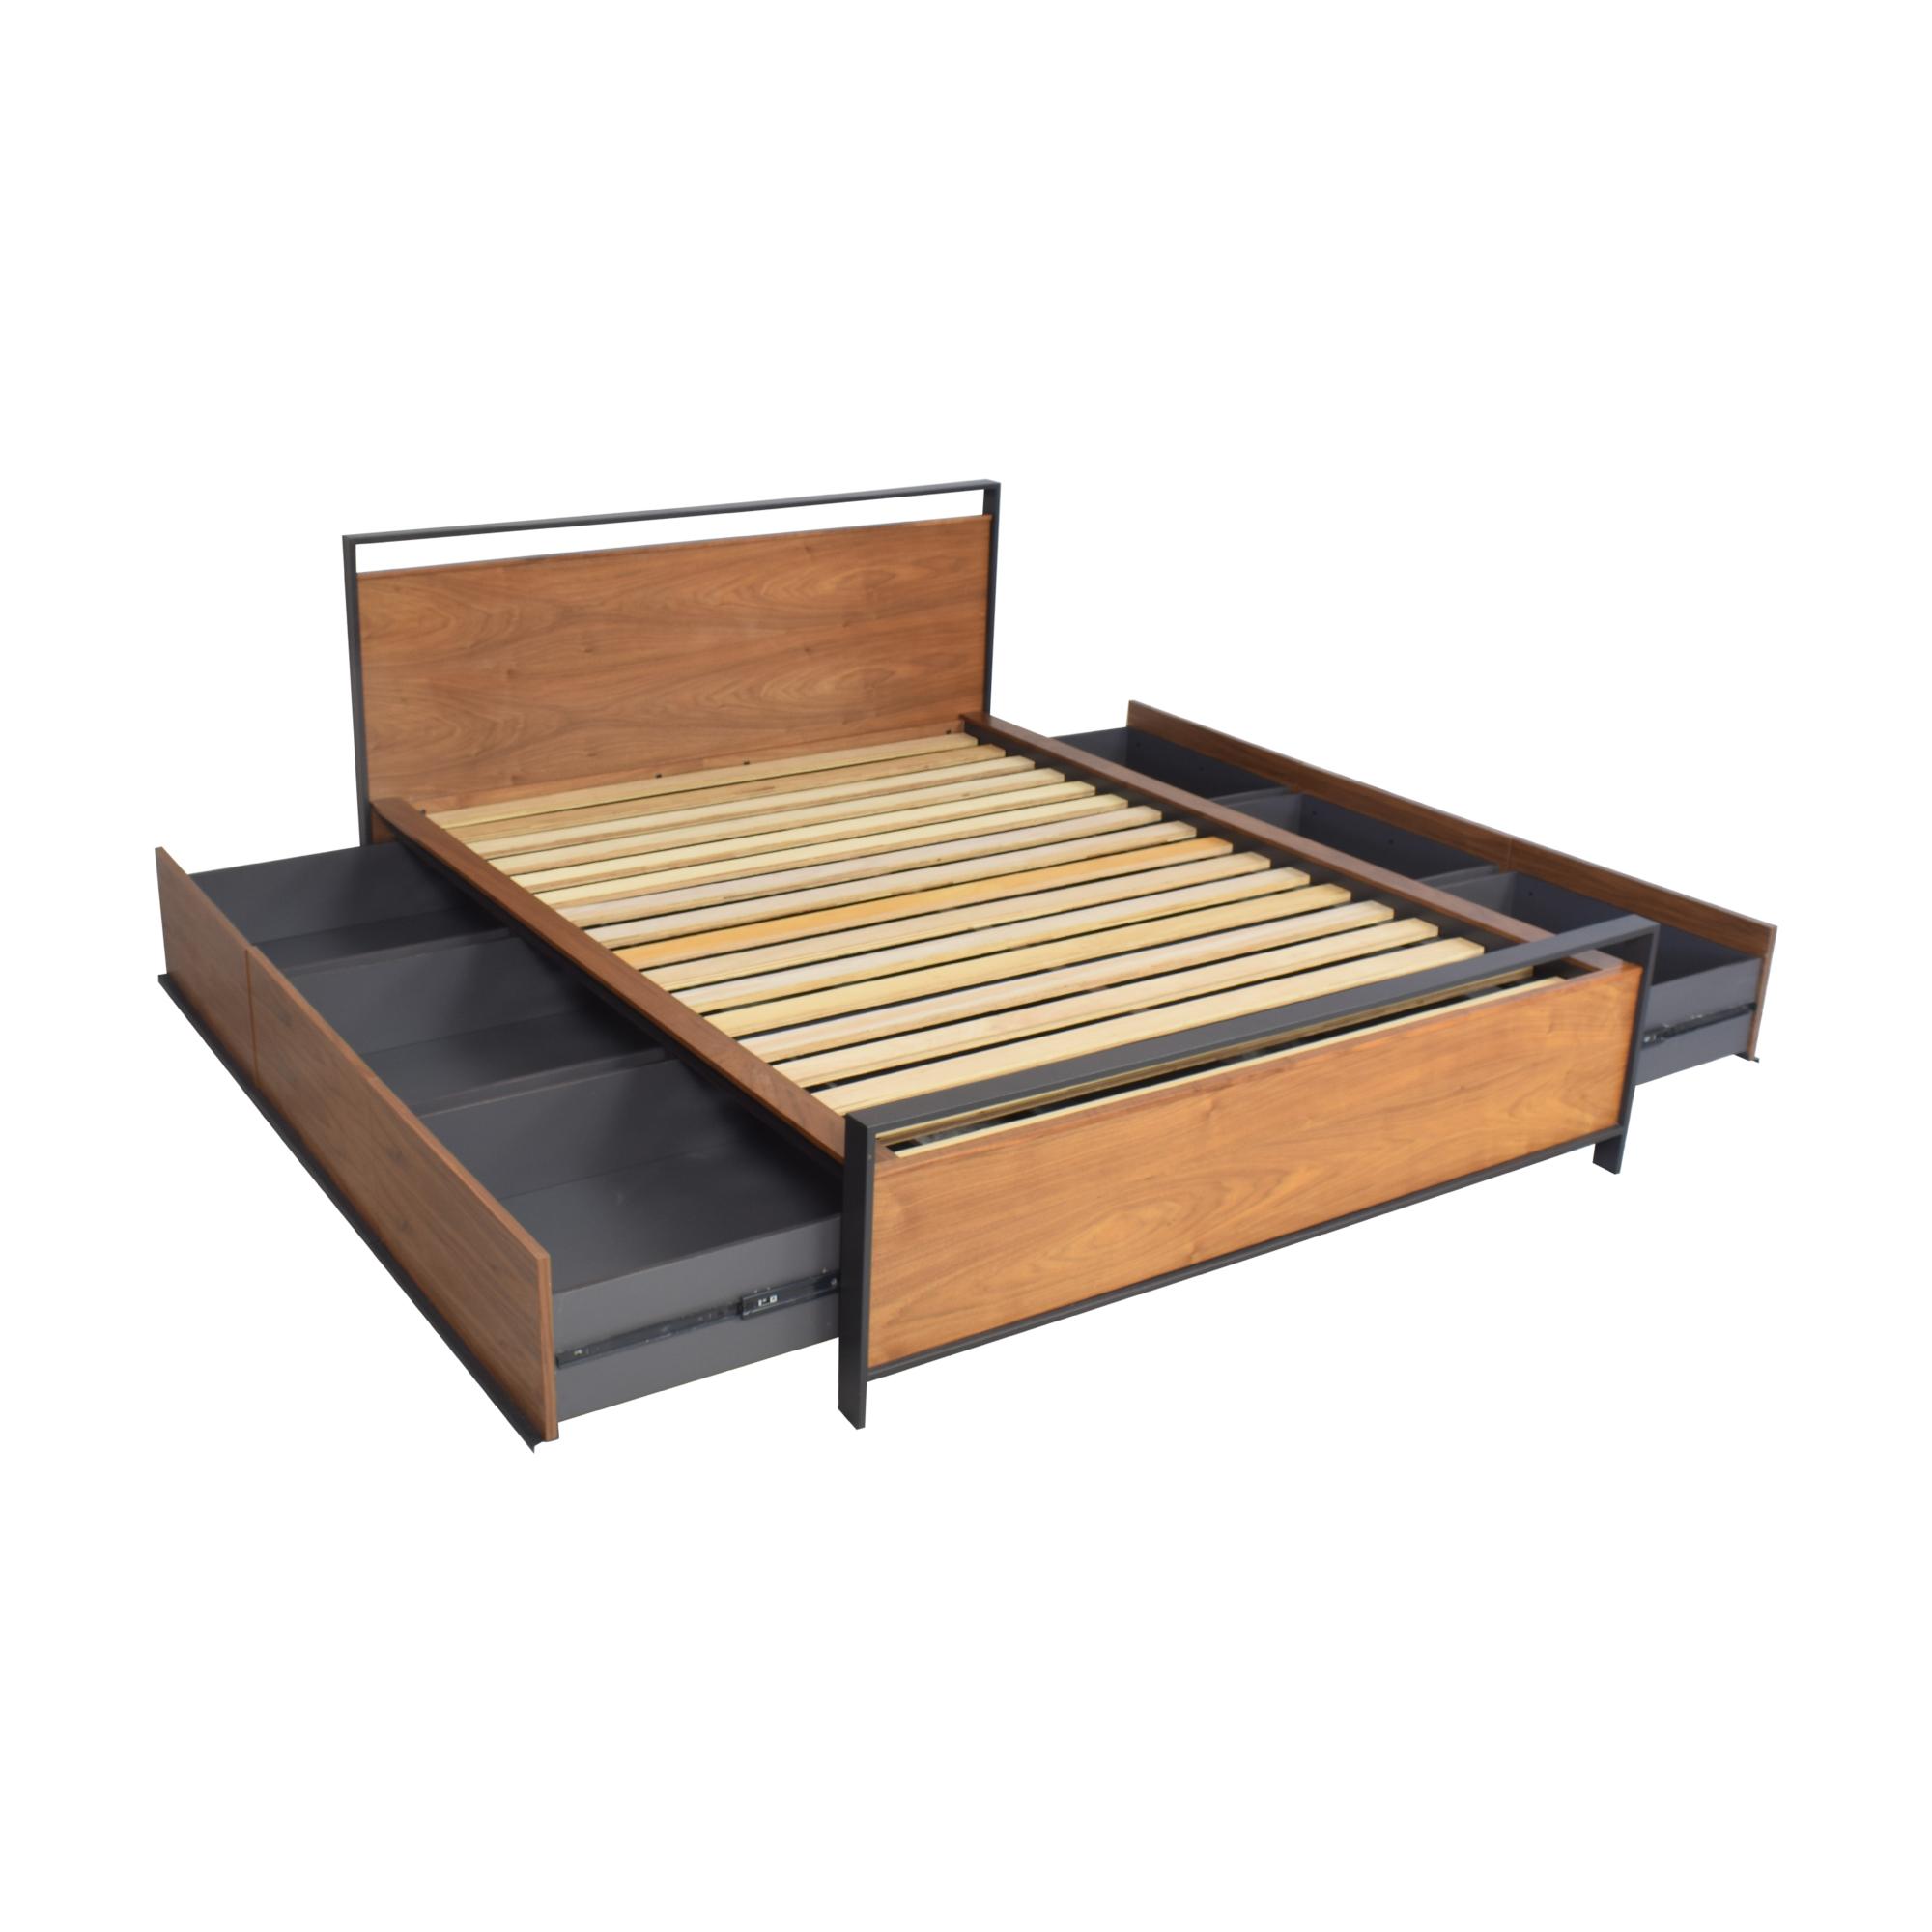 shop Crate & Barrel Bowery Storage Queen Bed Crate & Barrel Beds